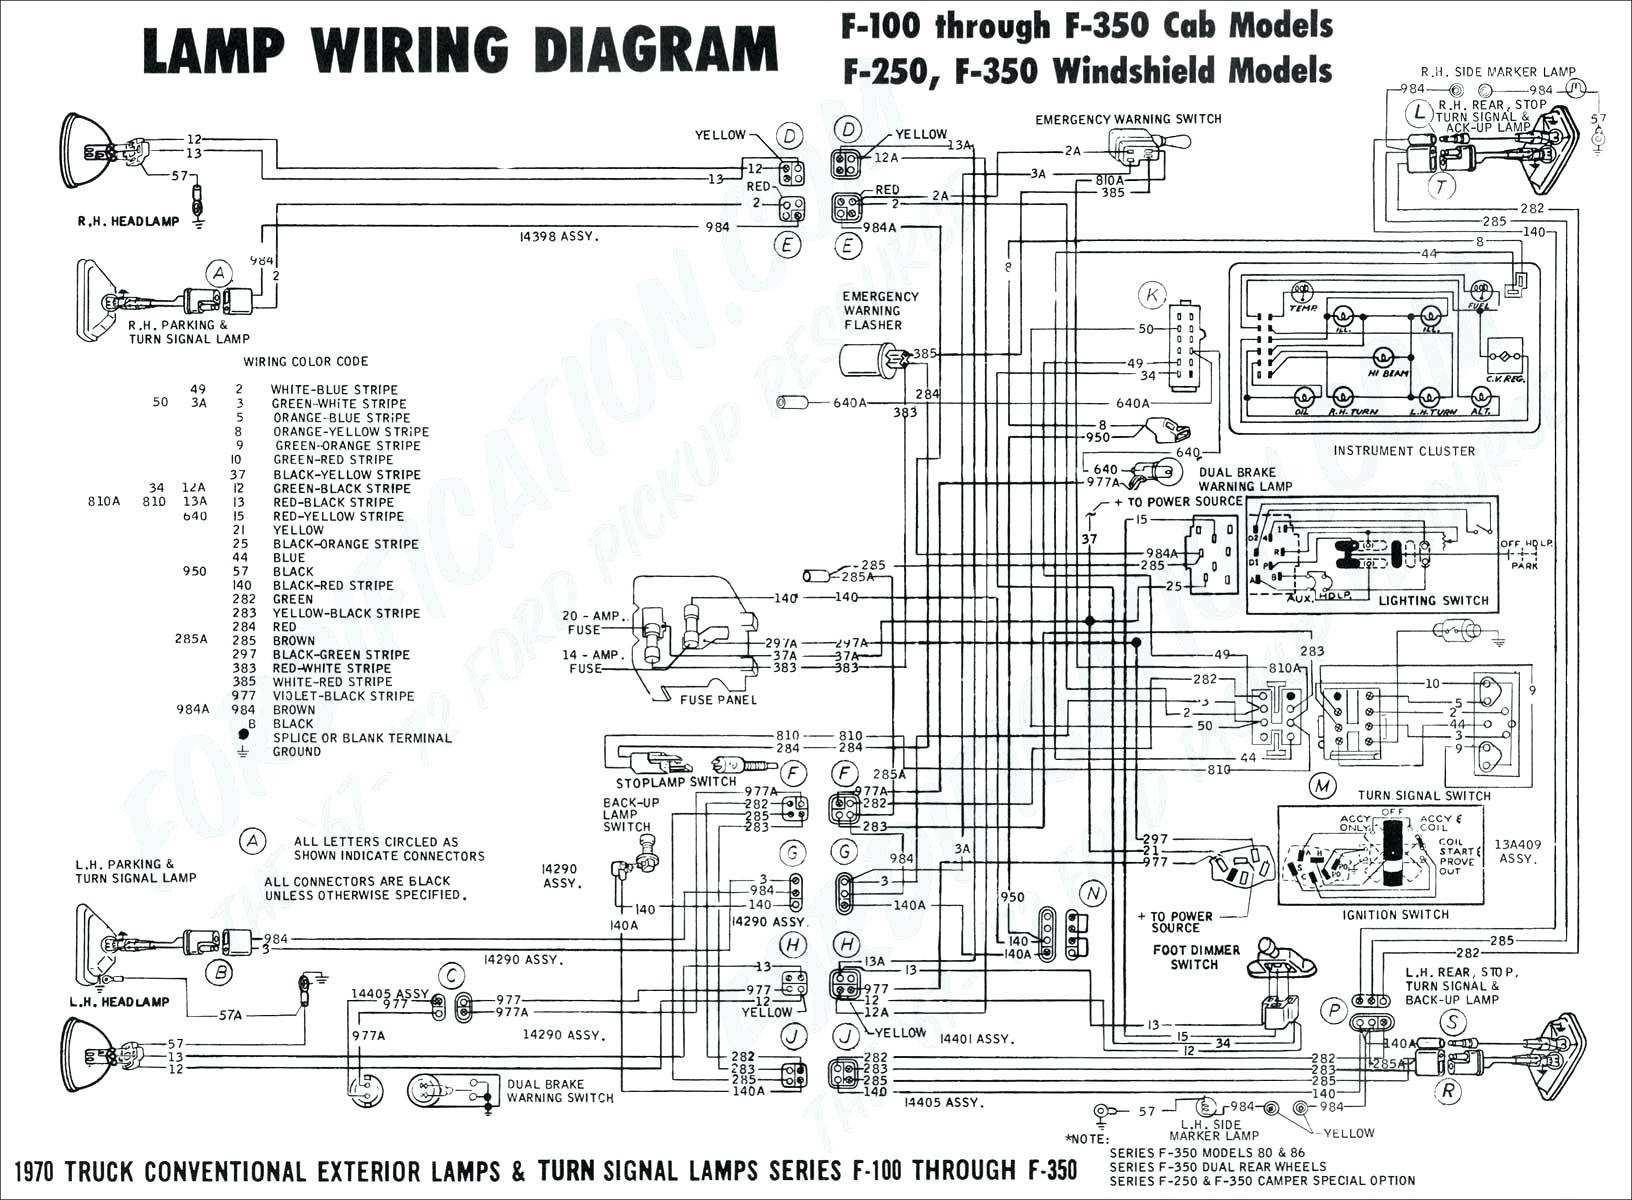 1997 Dodge Ram 1500 Trailer Wiring Diagram